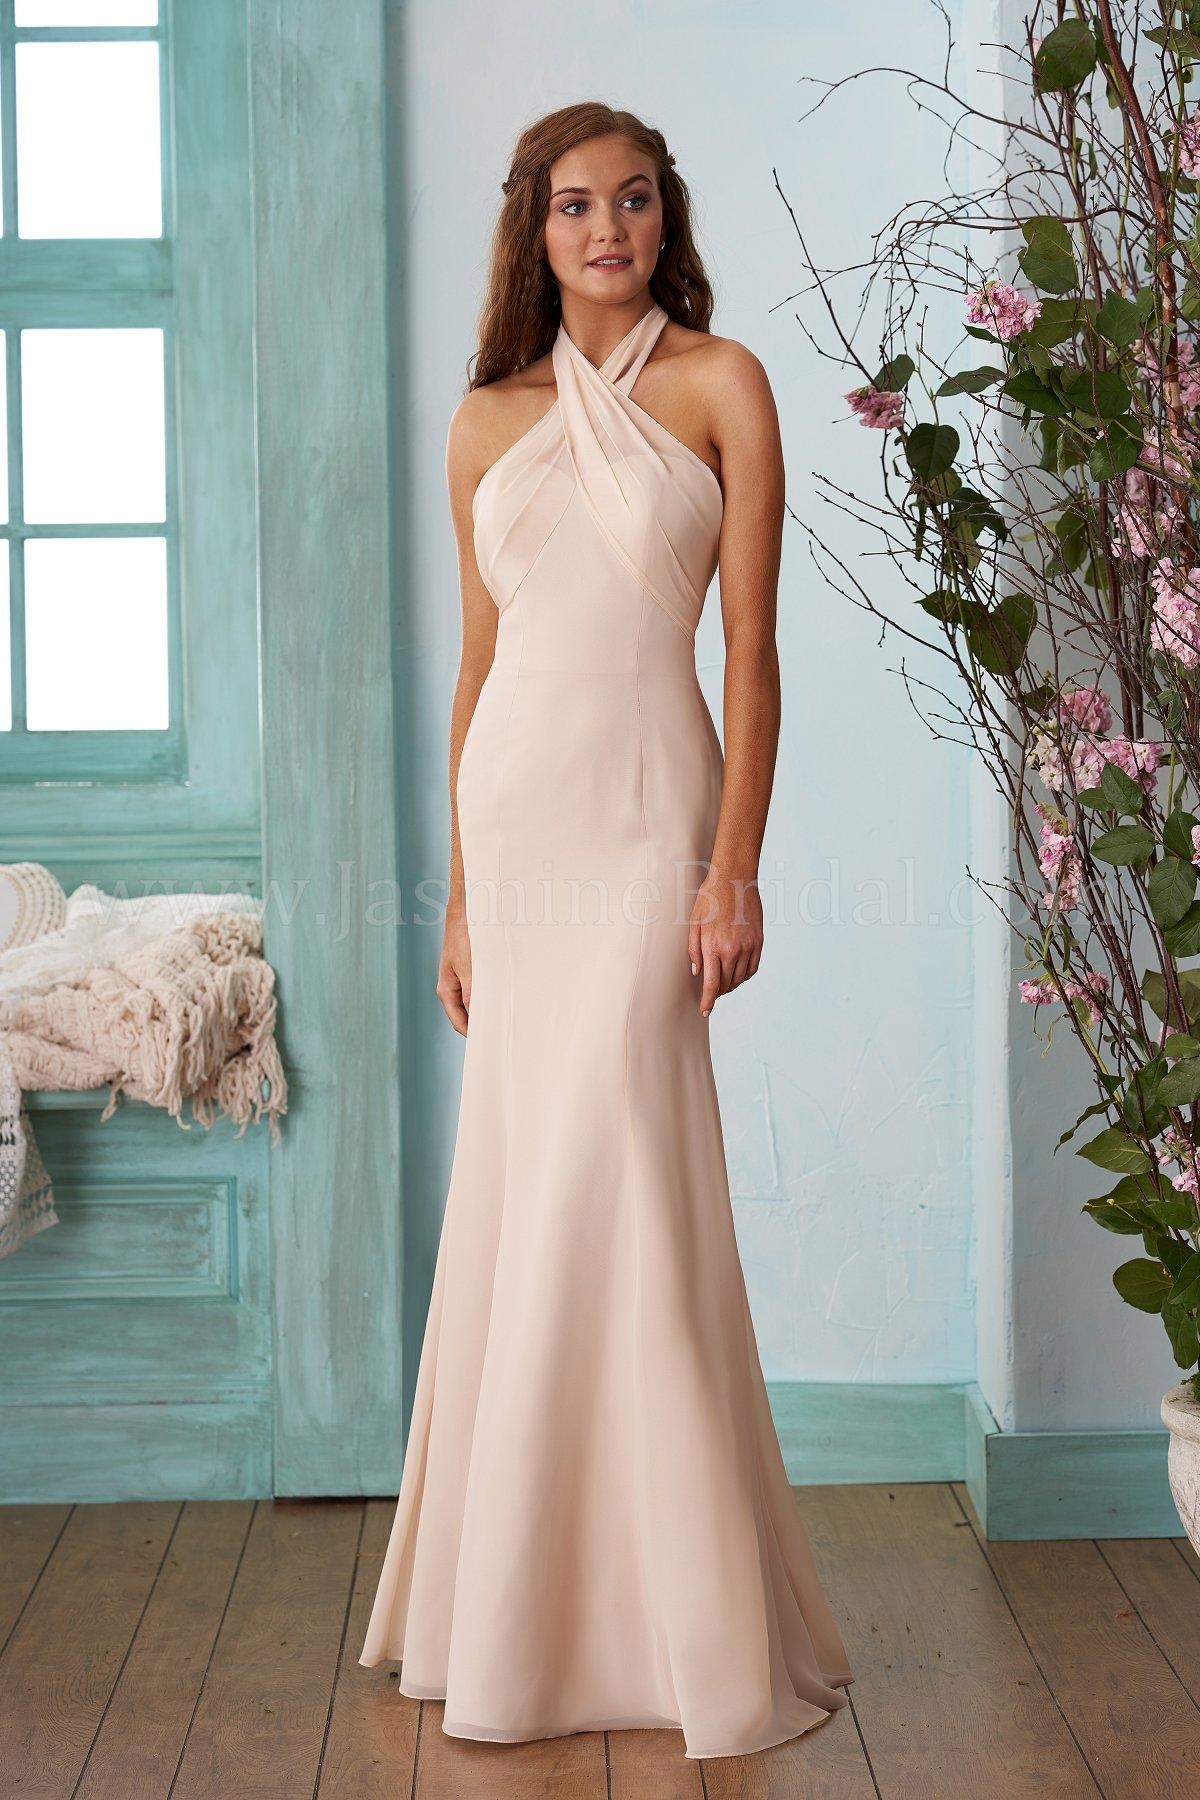 Lovable Long Sweeart Neckline Poly Chiffon Bridesmaid Dress Sash Bridesmaid Dresses 2017 Bridesmaid Dresses 2018 wedding dress Unique Bridesmaid Dresses